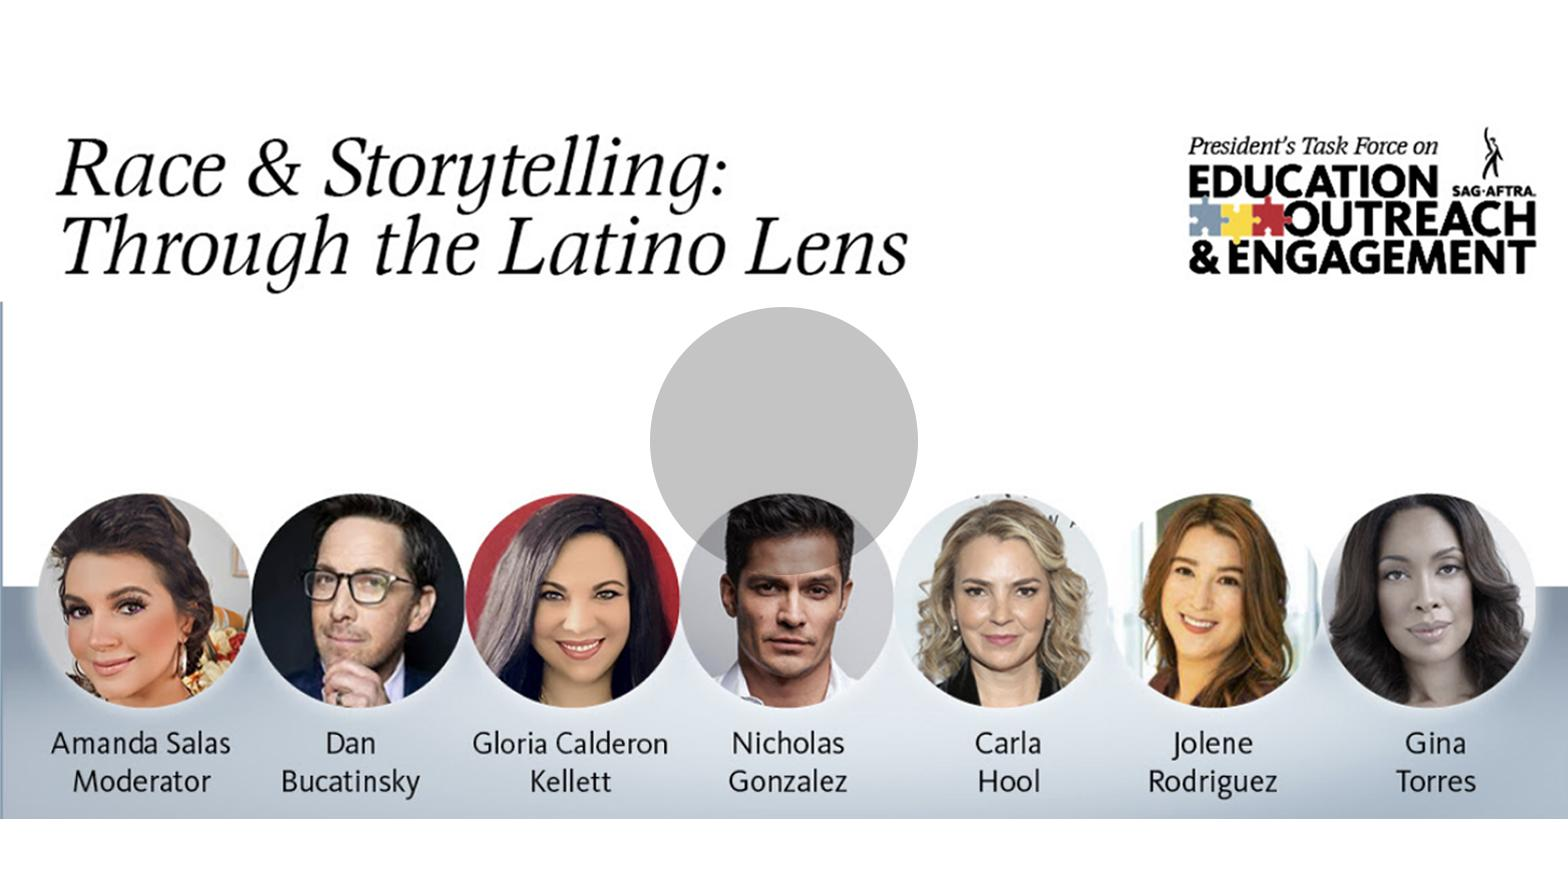 """Race & Storytelling: Through the Latino Lens"" en la parte superior en negro. LR disparos a la cabeza de Salas, Bucatinsky, Calderon Kellet, Gonzalez, Hool, Rodriguez, Torres"